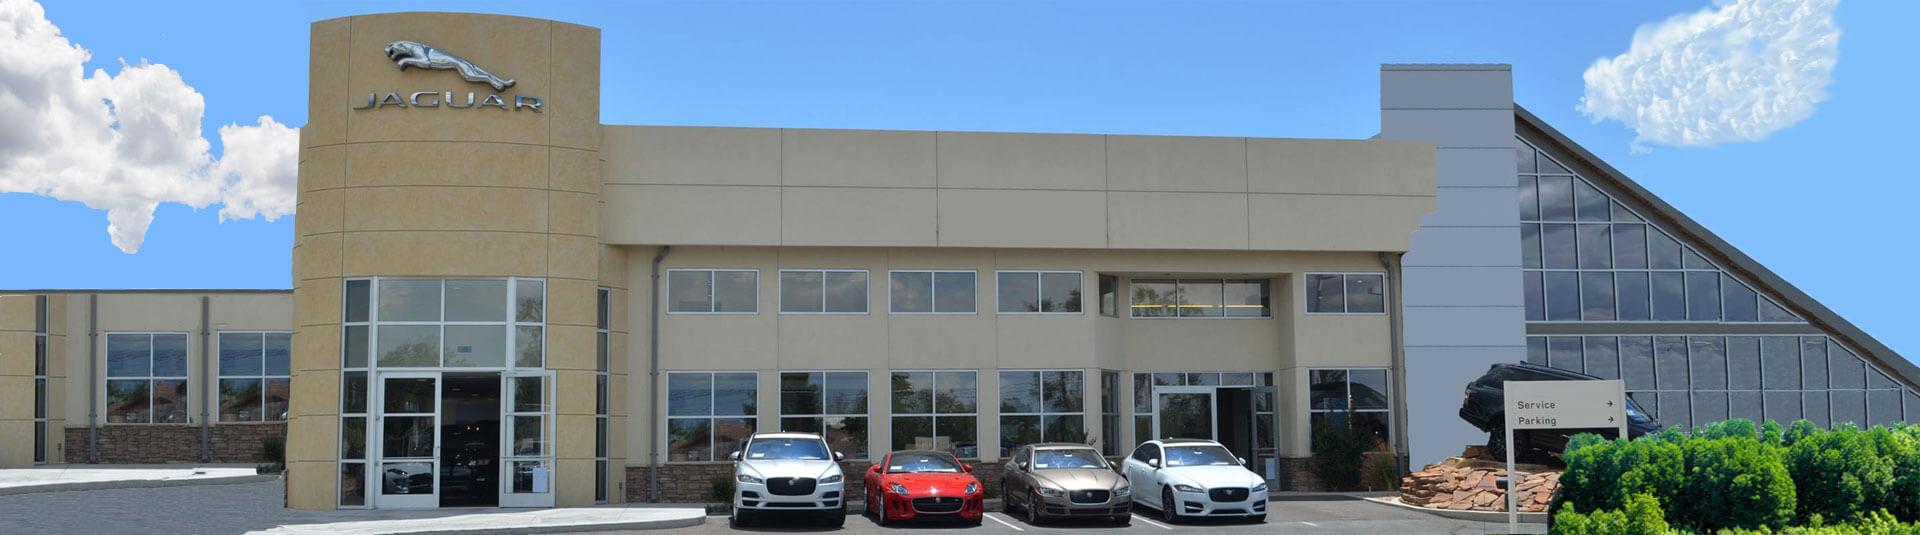 pace lease type fairfield dealership ct near luxury car bridgeport f jaguar dealers june